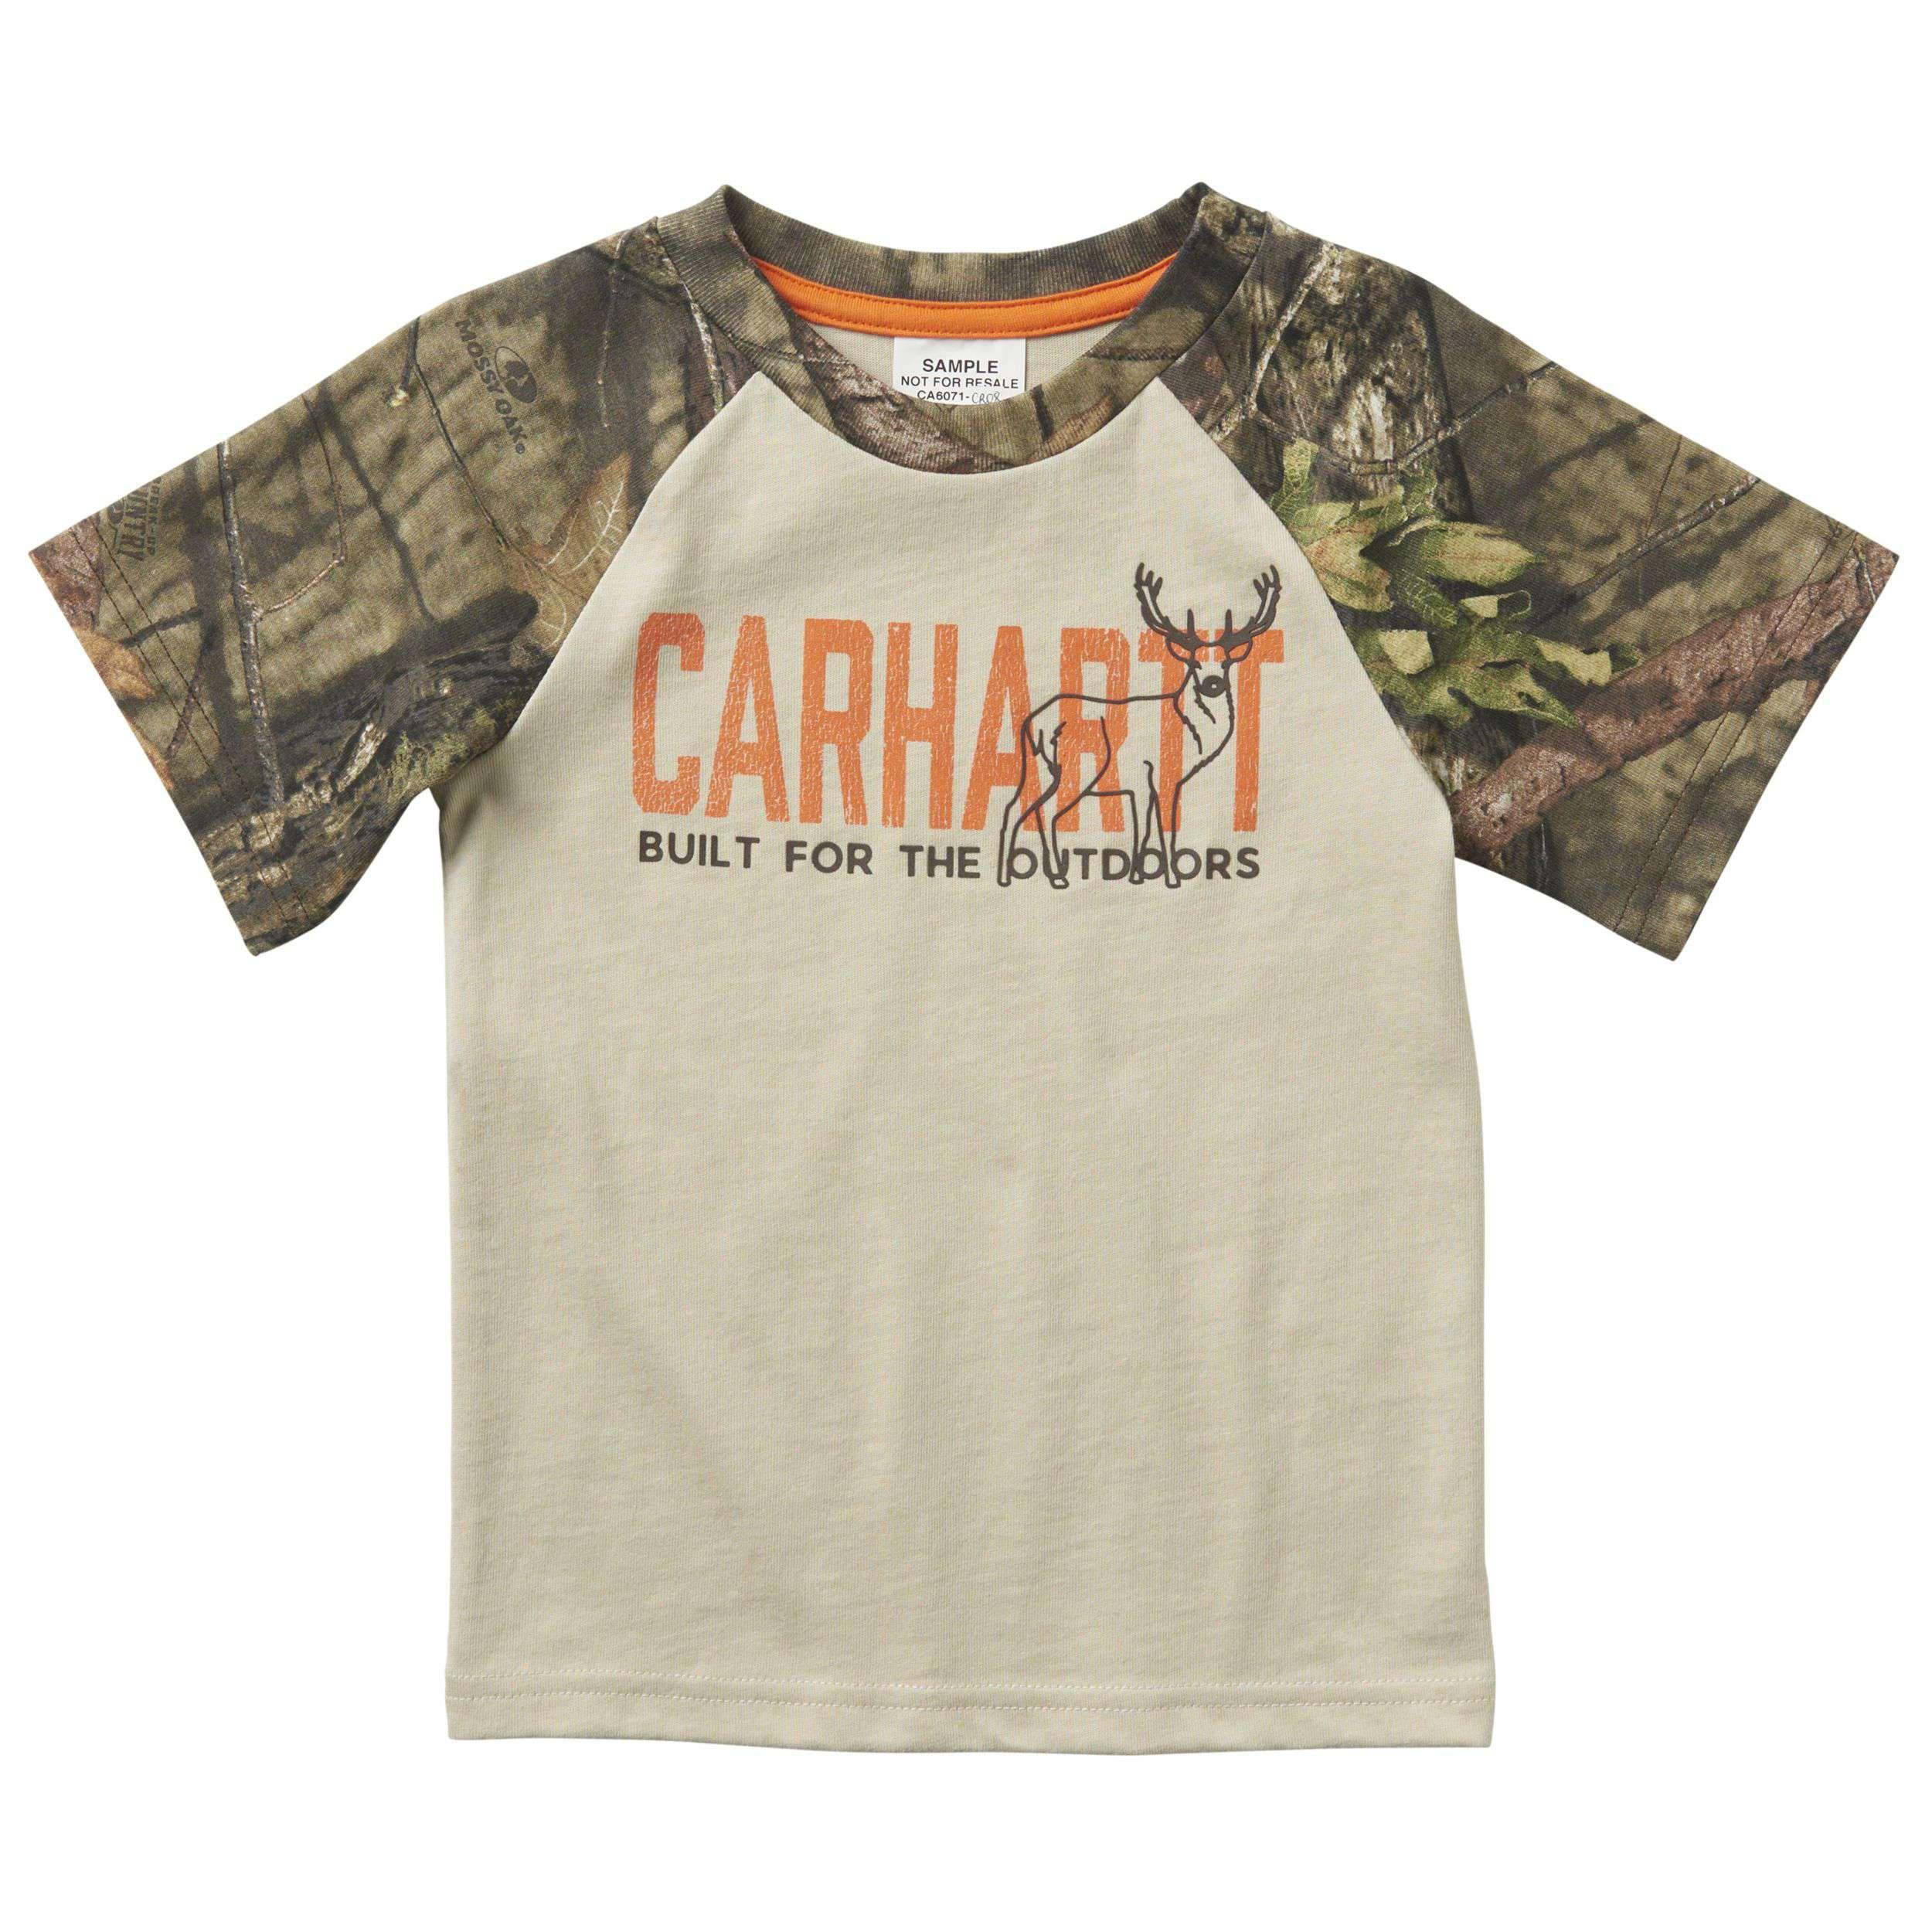 Carhartt Built for Outdoors Tee